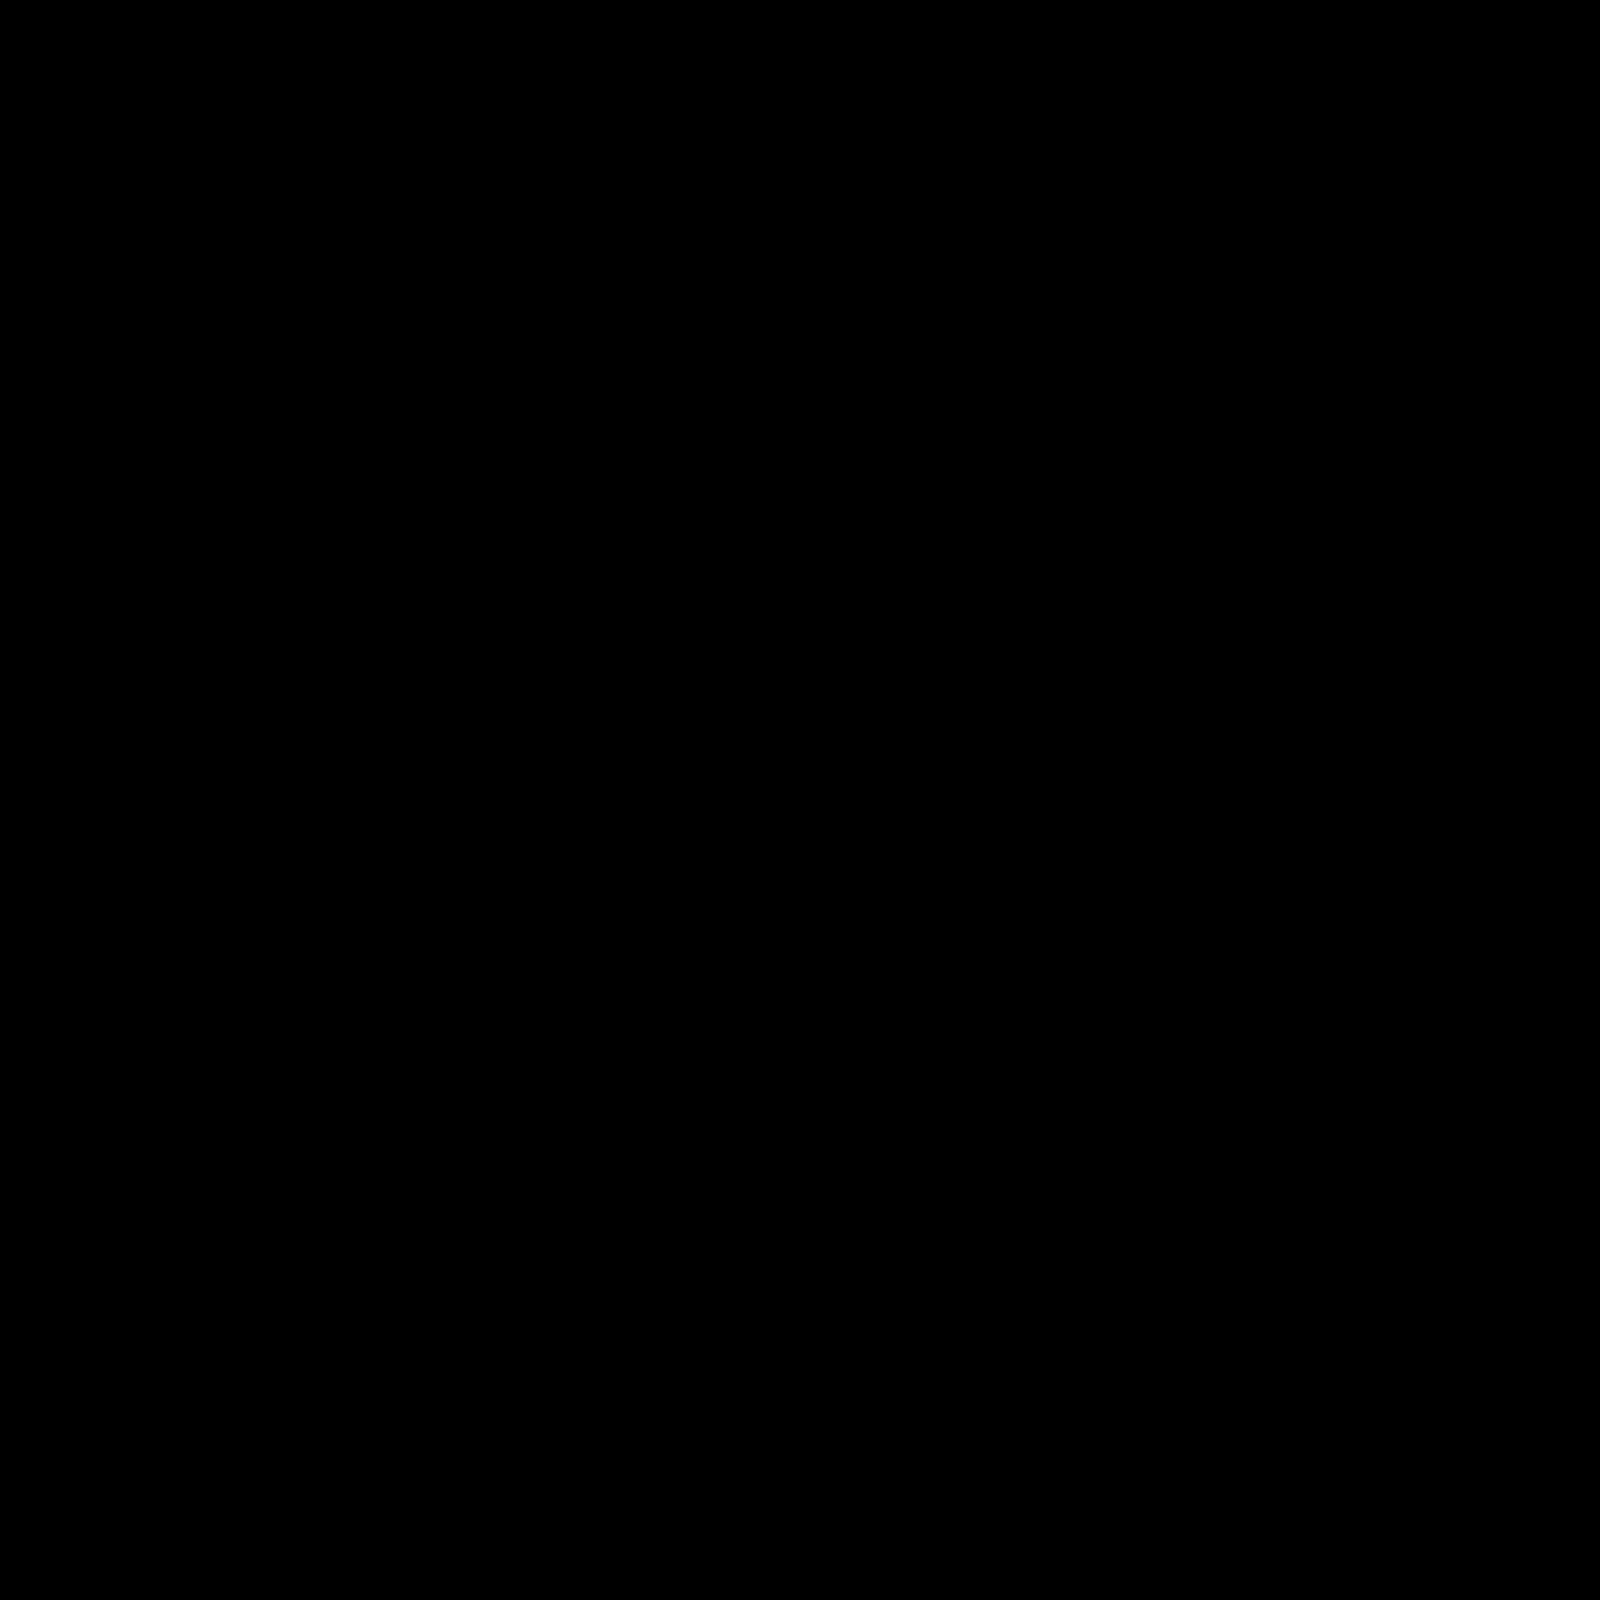 Google logo white png, Google logo white png Transparent ... - Google Logo White